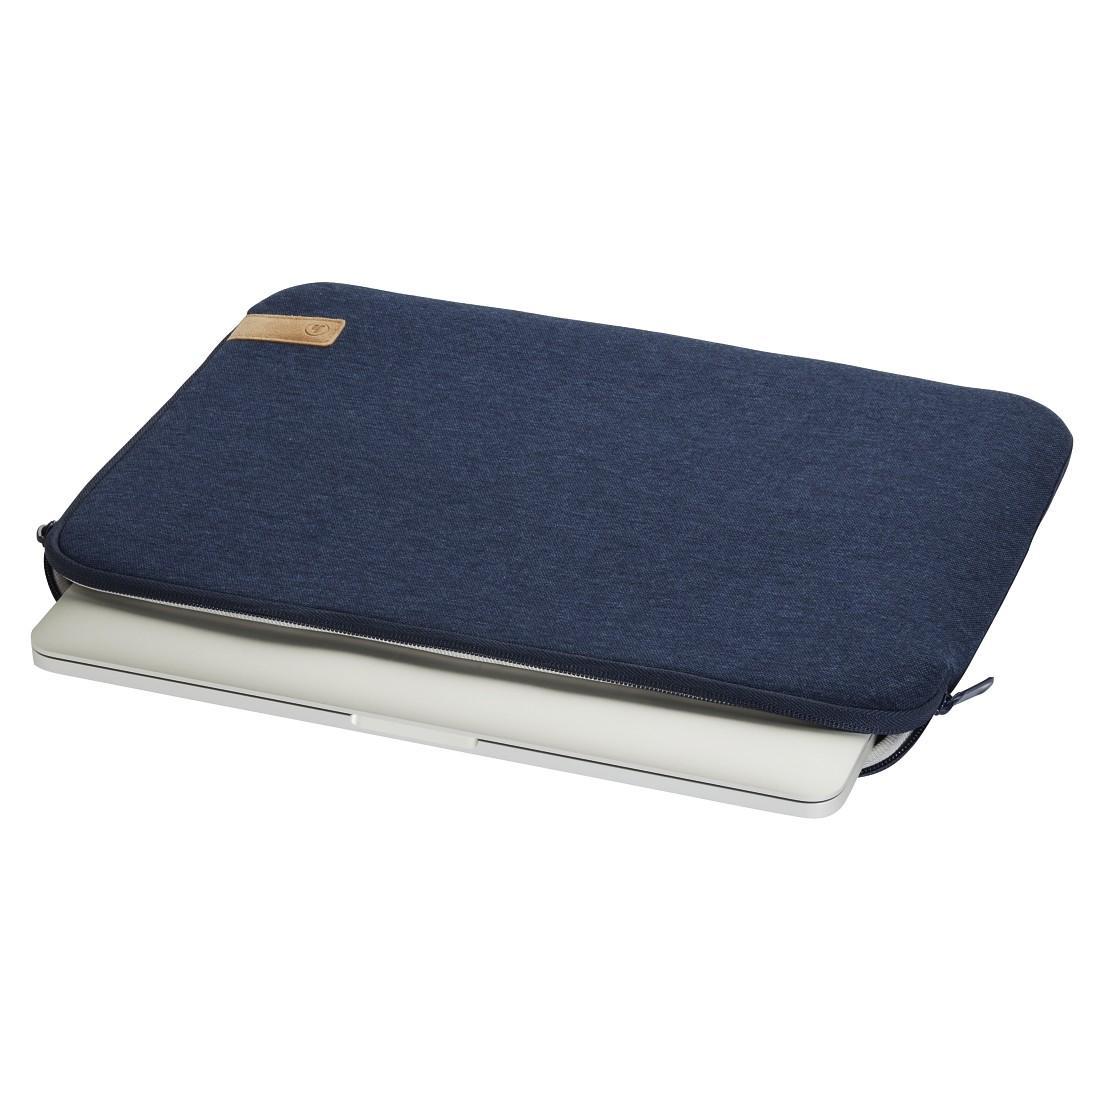 "Универсален калъф за лаптоп HAMA Jersey, до 30 см  (11.6""), Син"